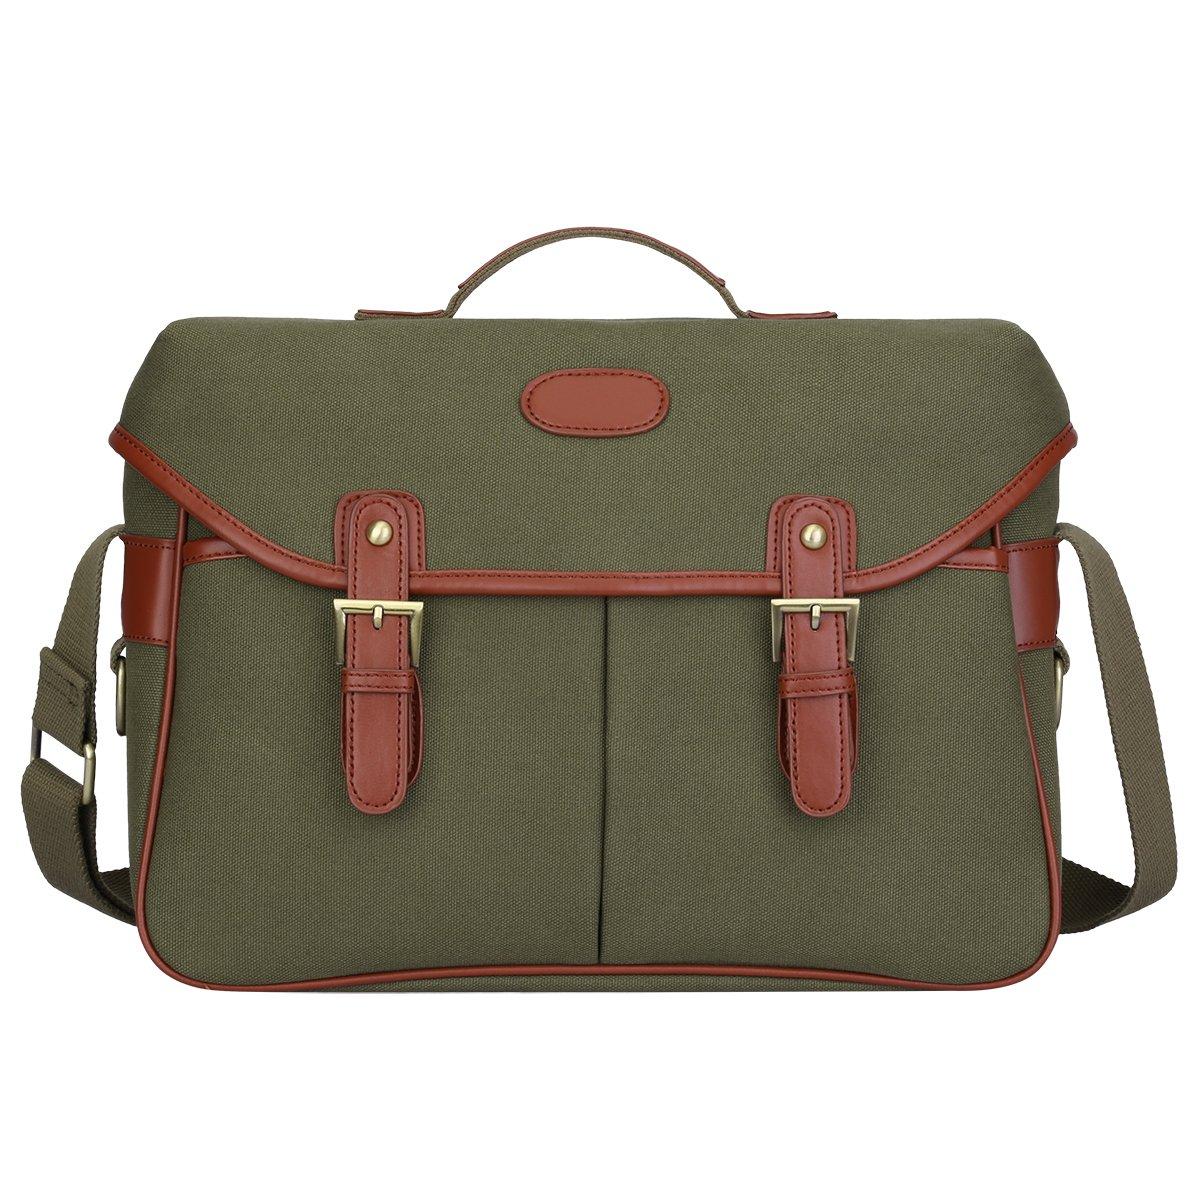 S-ZONE Fashion Canvas DSLR SLR Vintage Camera Bag Messenger Bag (Army Green)